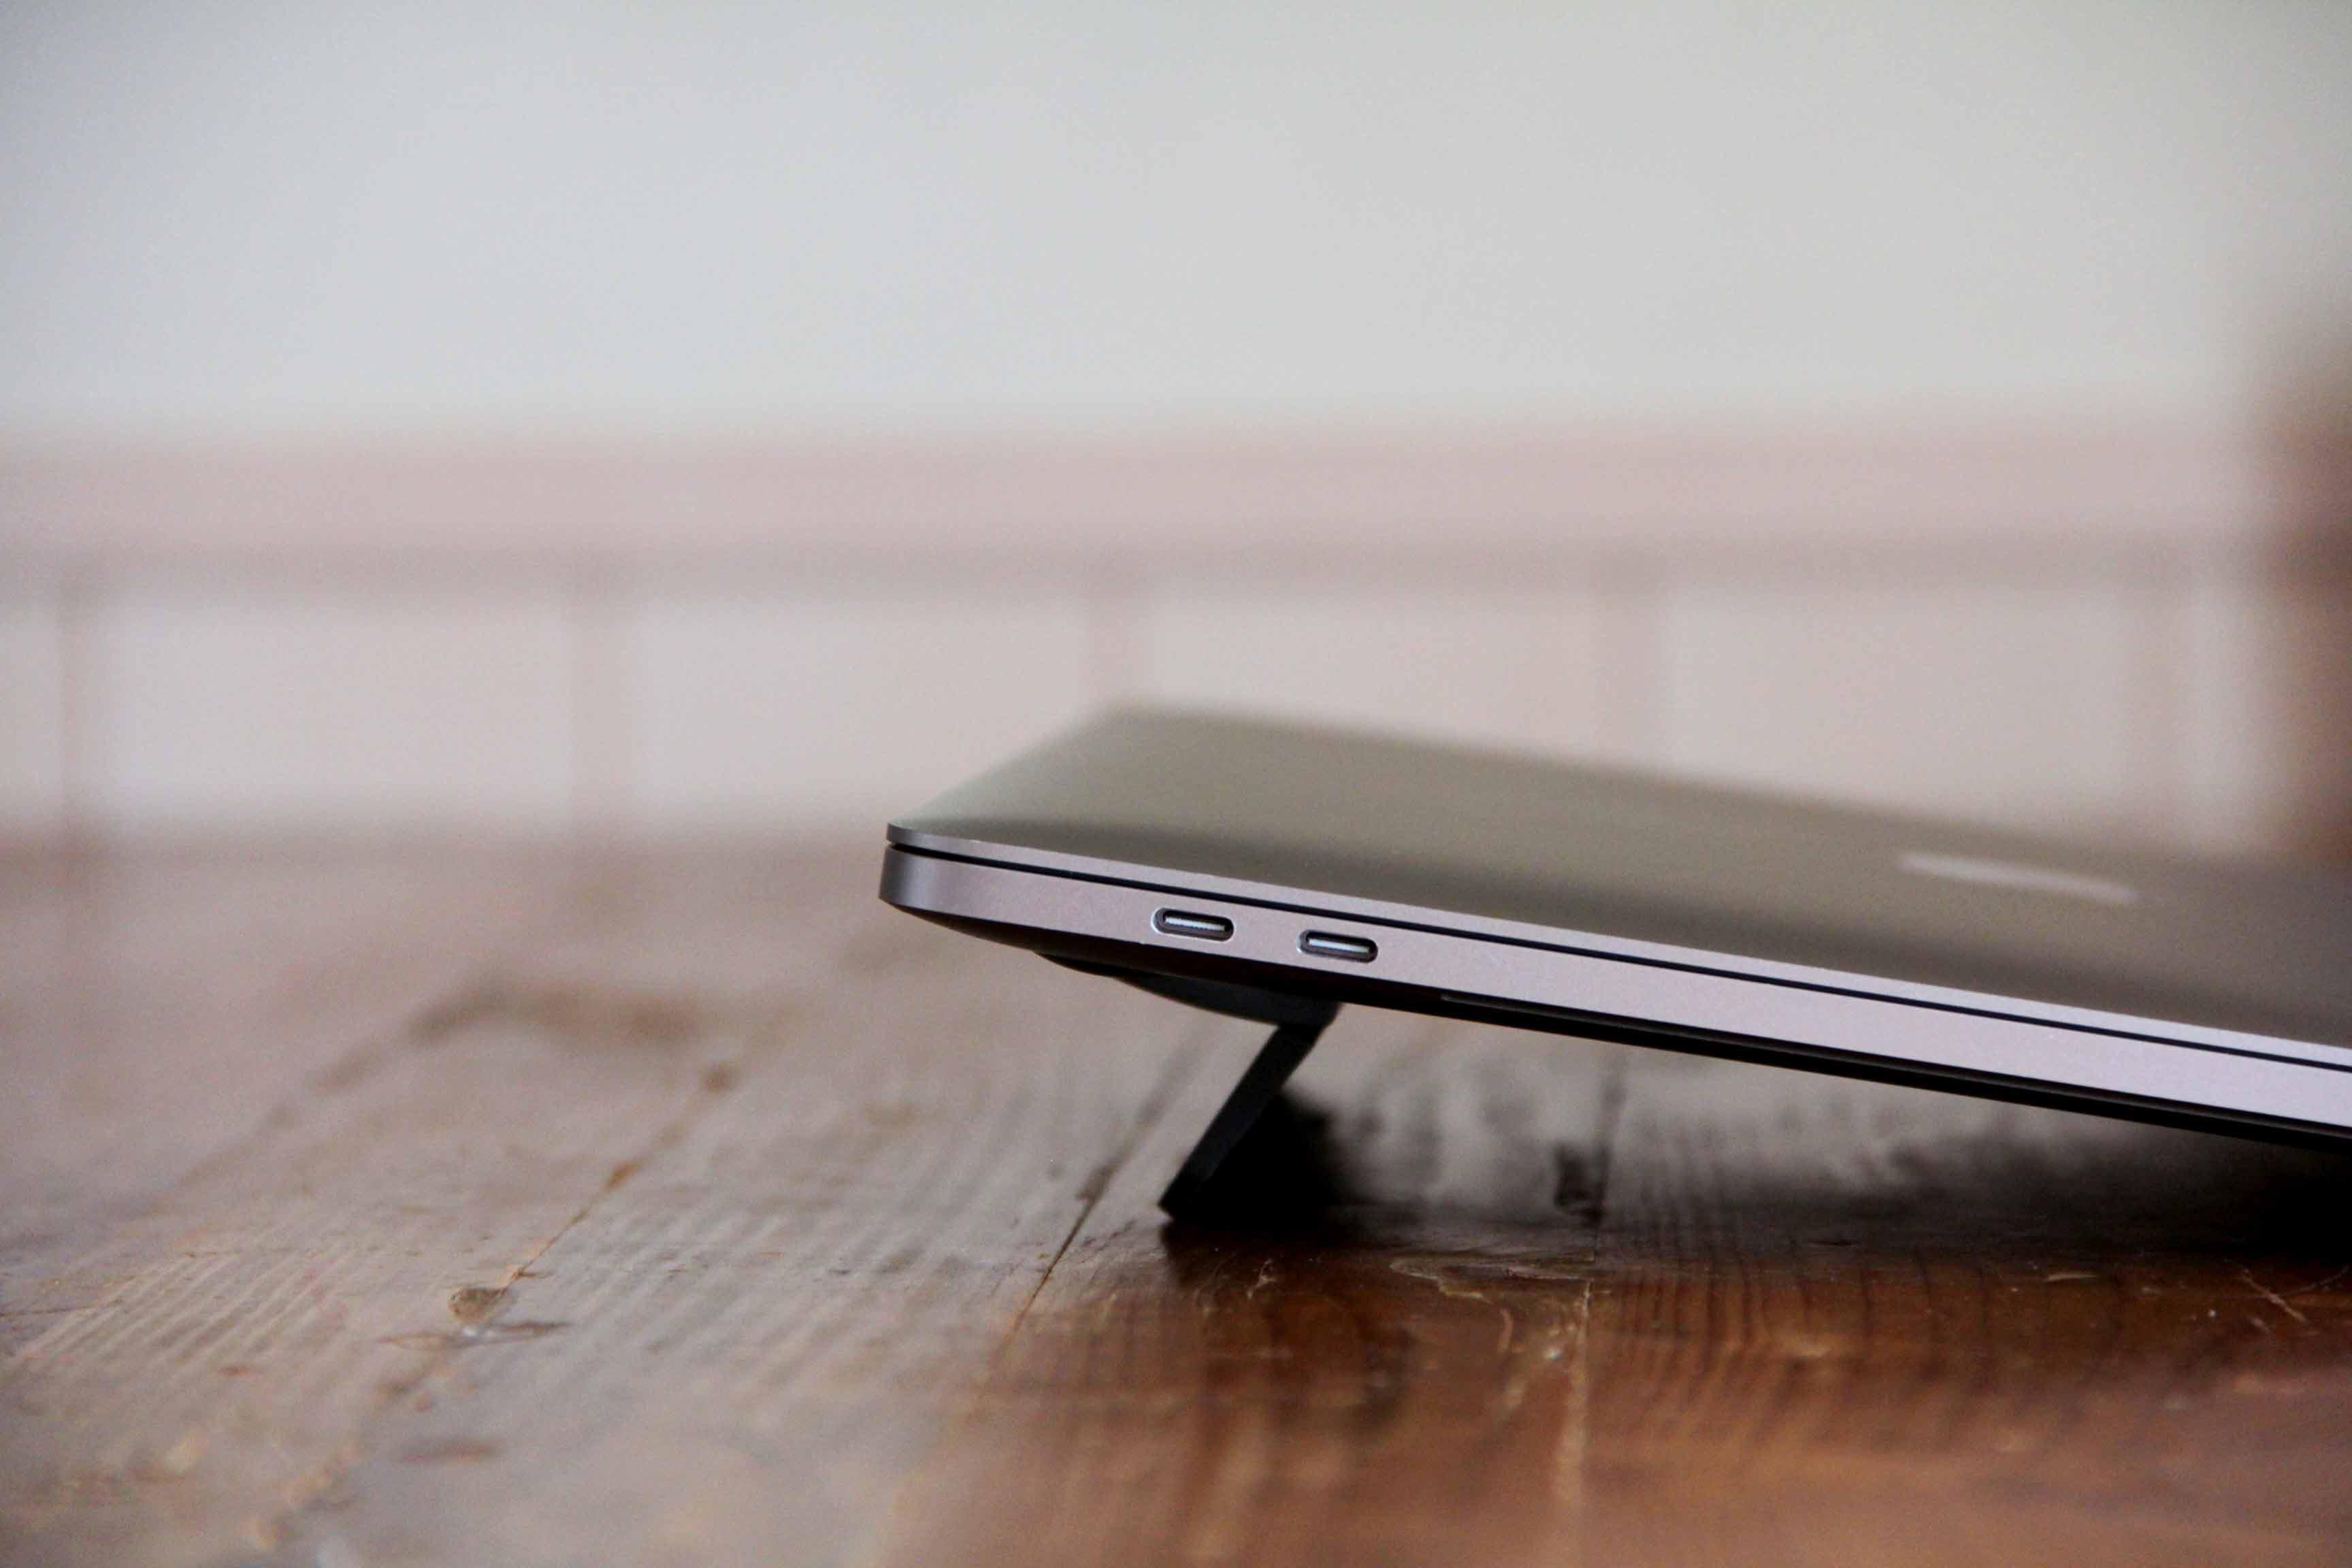 MacBook用kickflipフリップスタンド本体を装着した写真